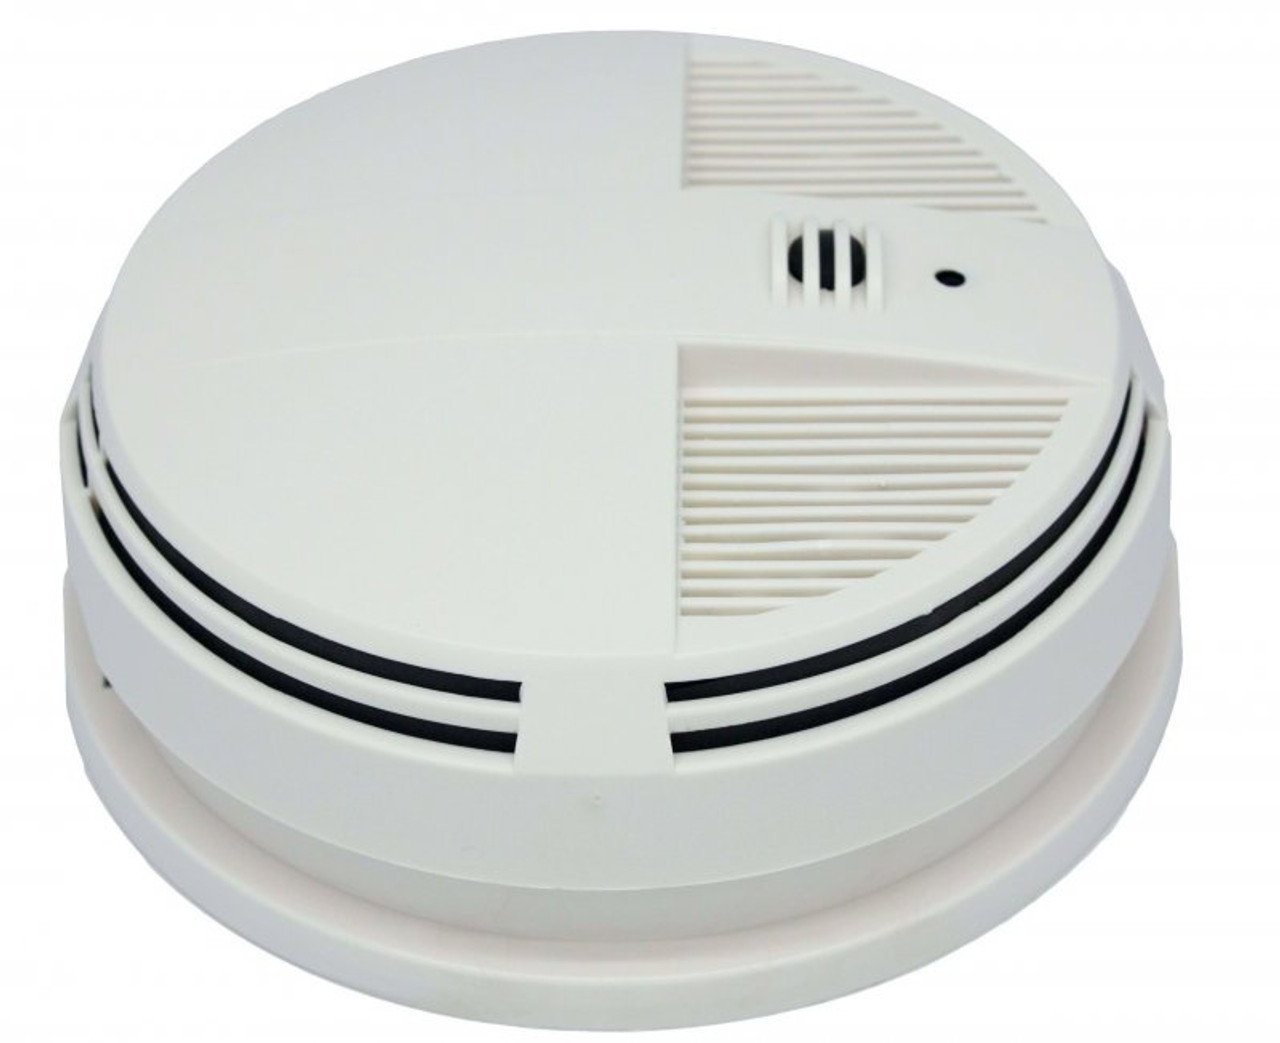 Xtreme Life Wi-Fi Night Vision Smoke Detector (side view) Hidden Camera